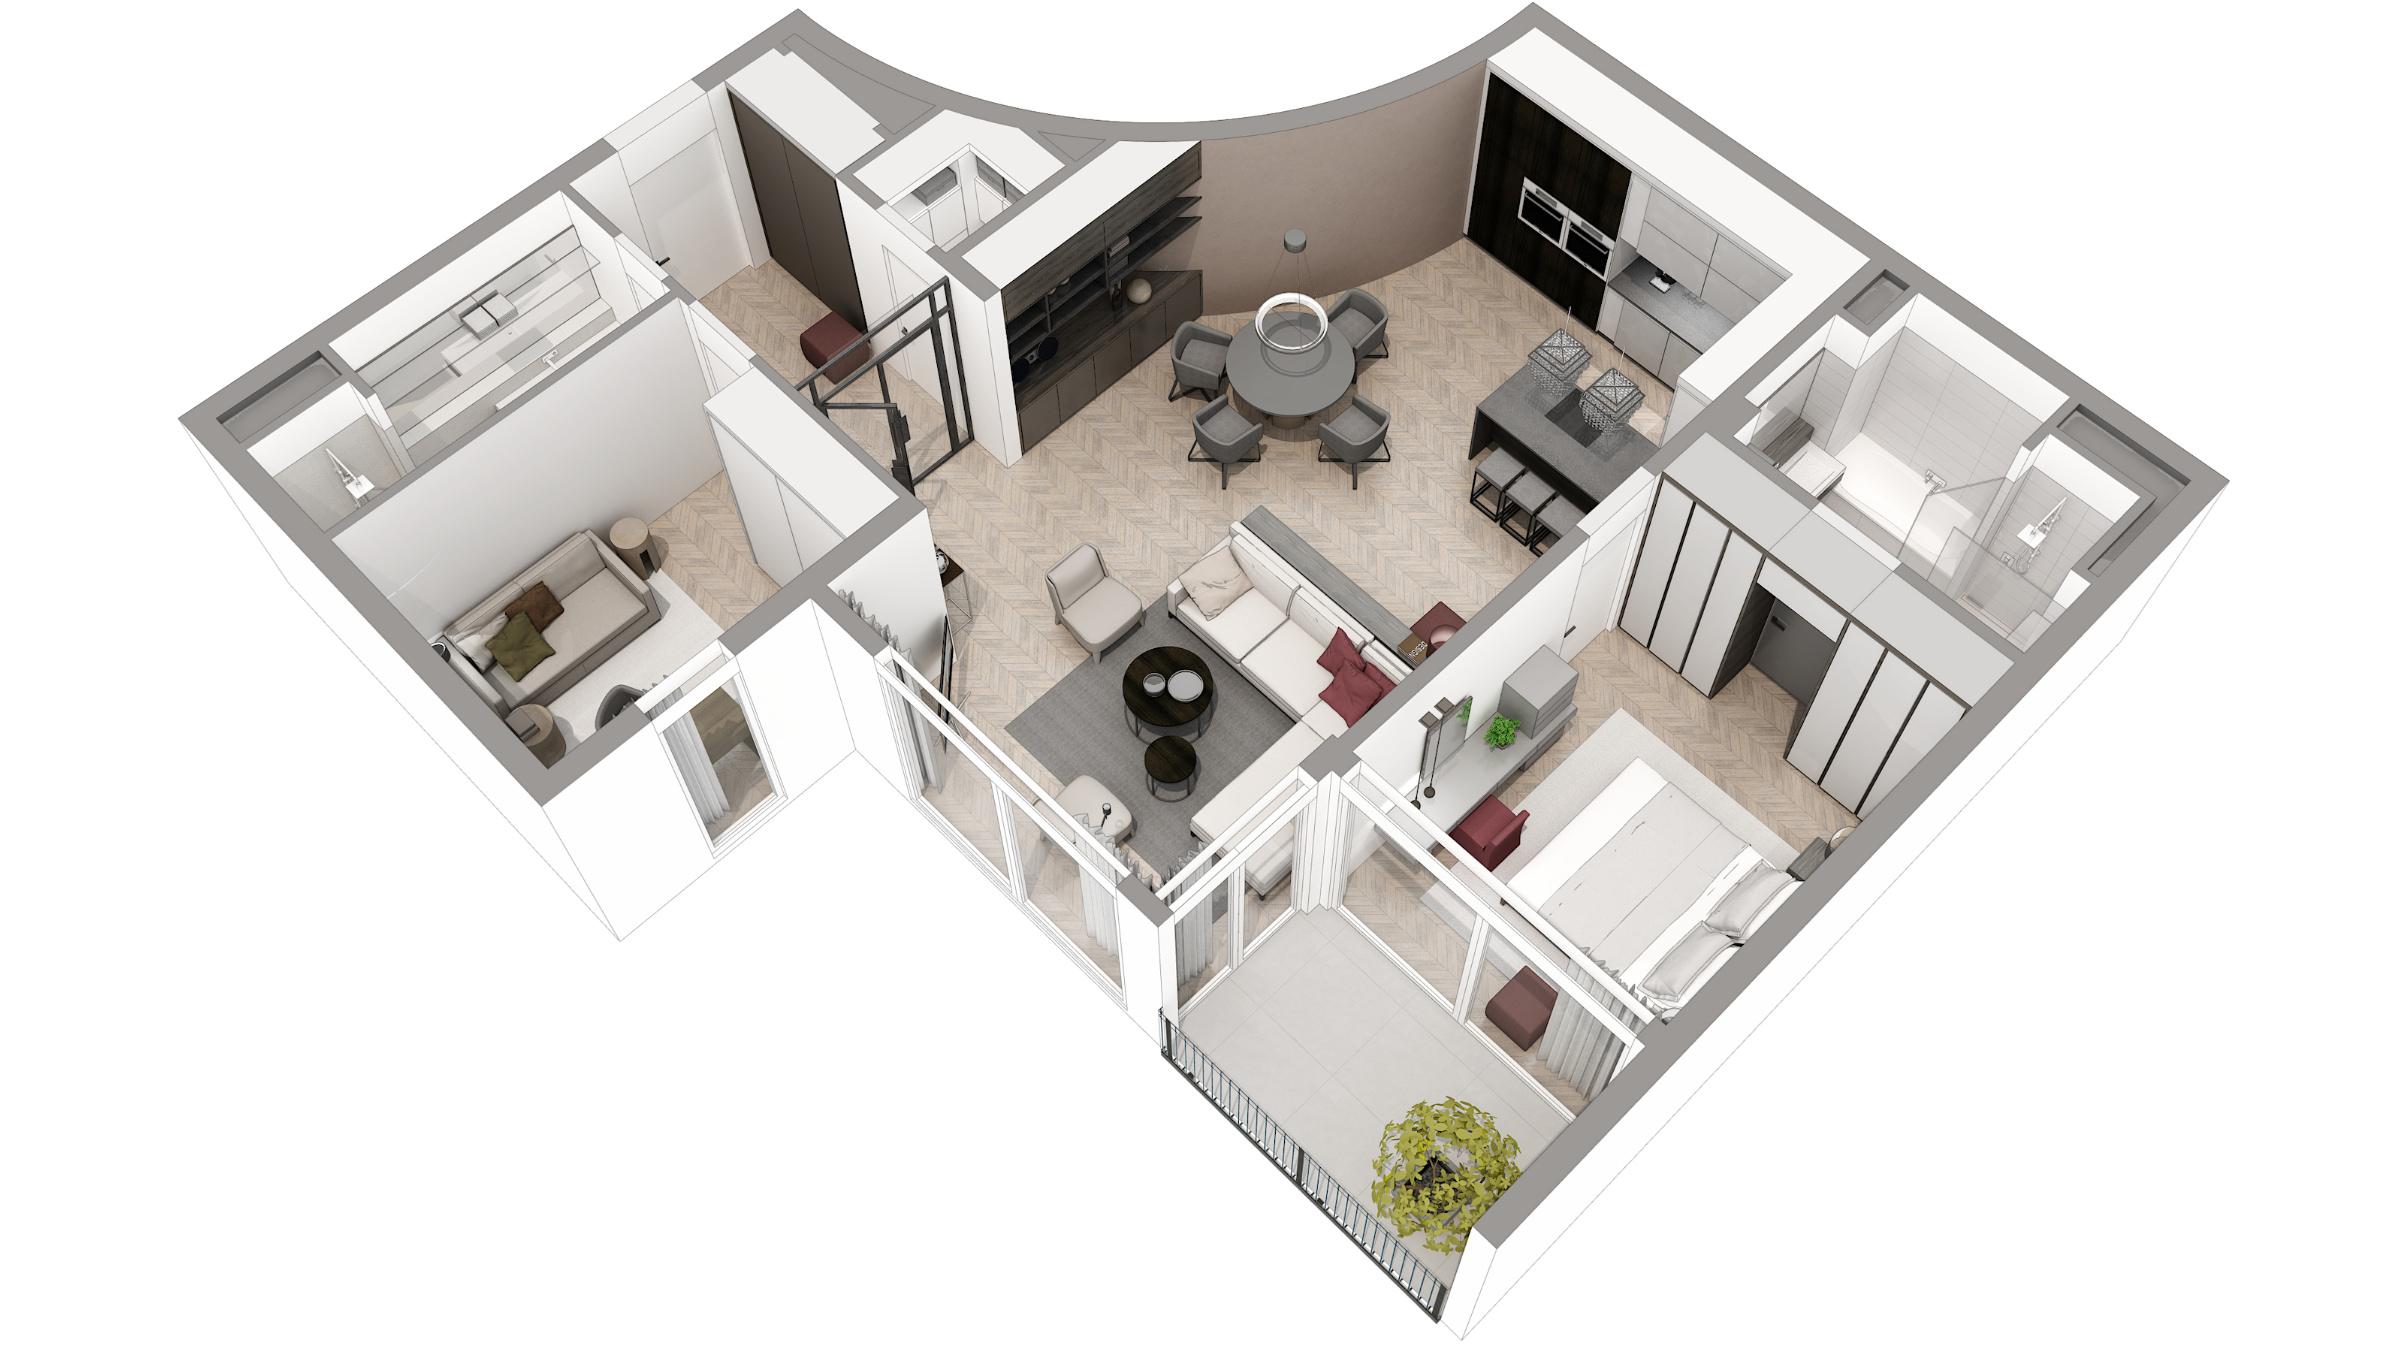 3D floor-plan production